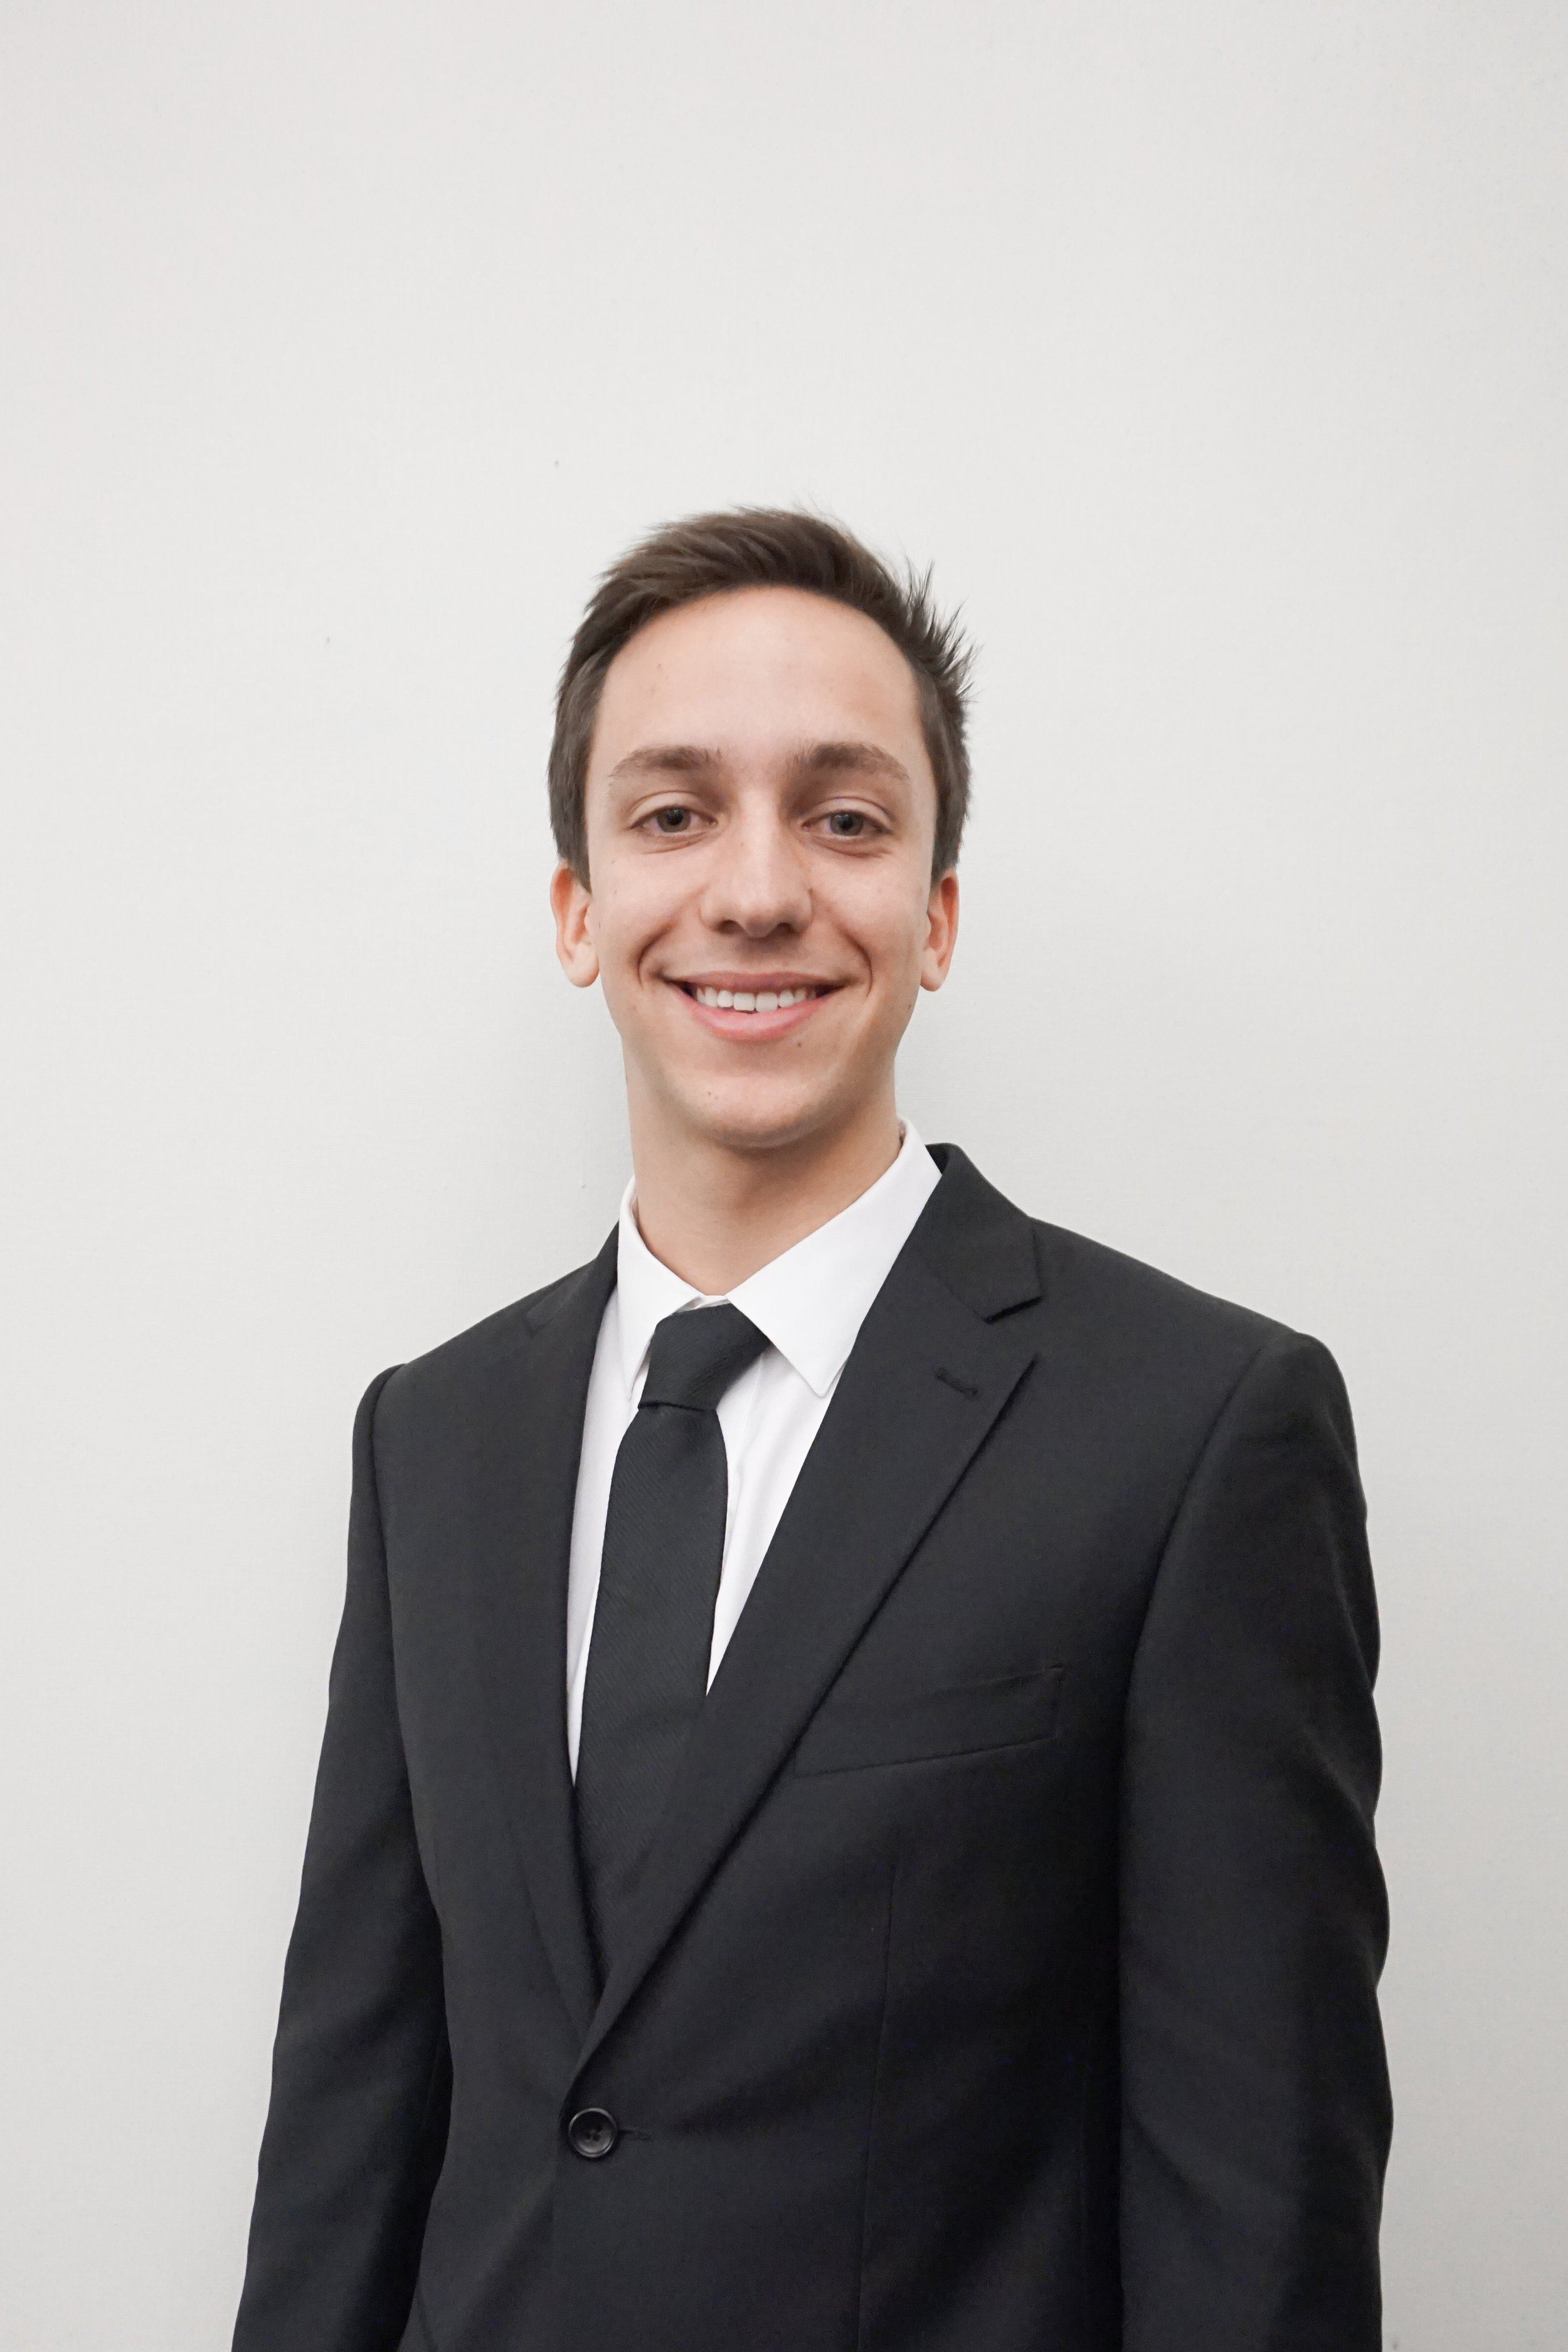 Matthew Robbins - 2020 | Major: Finance